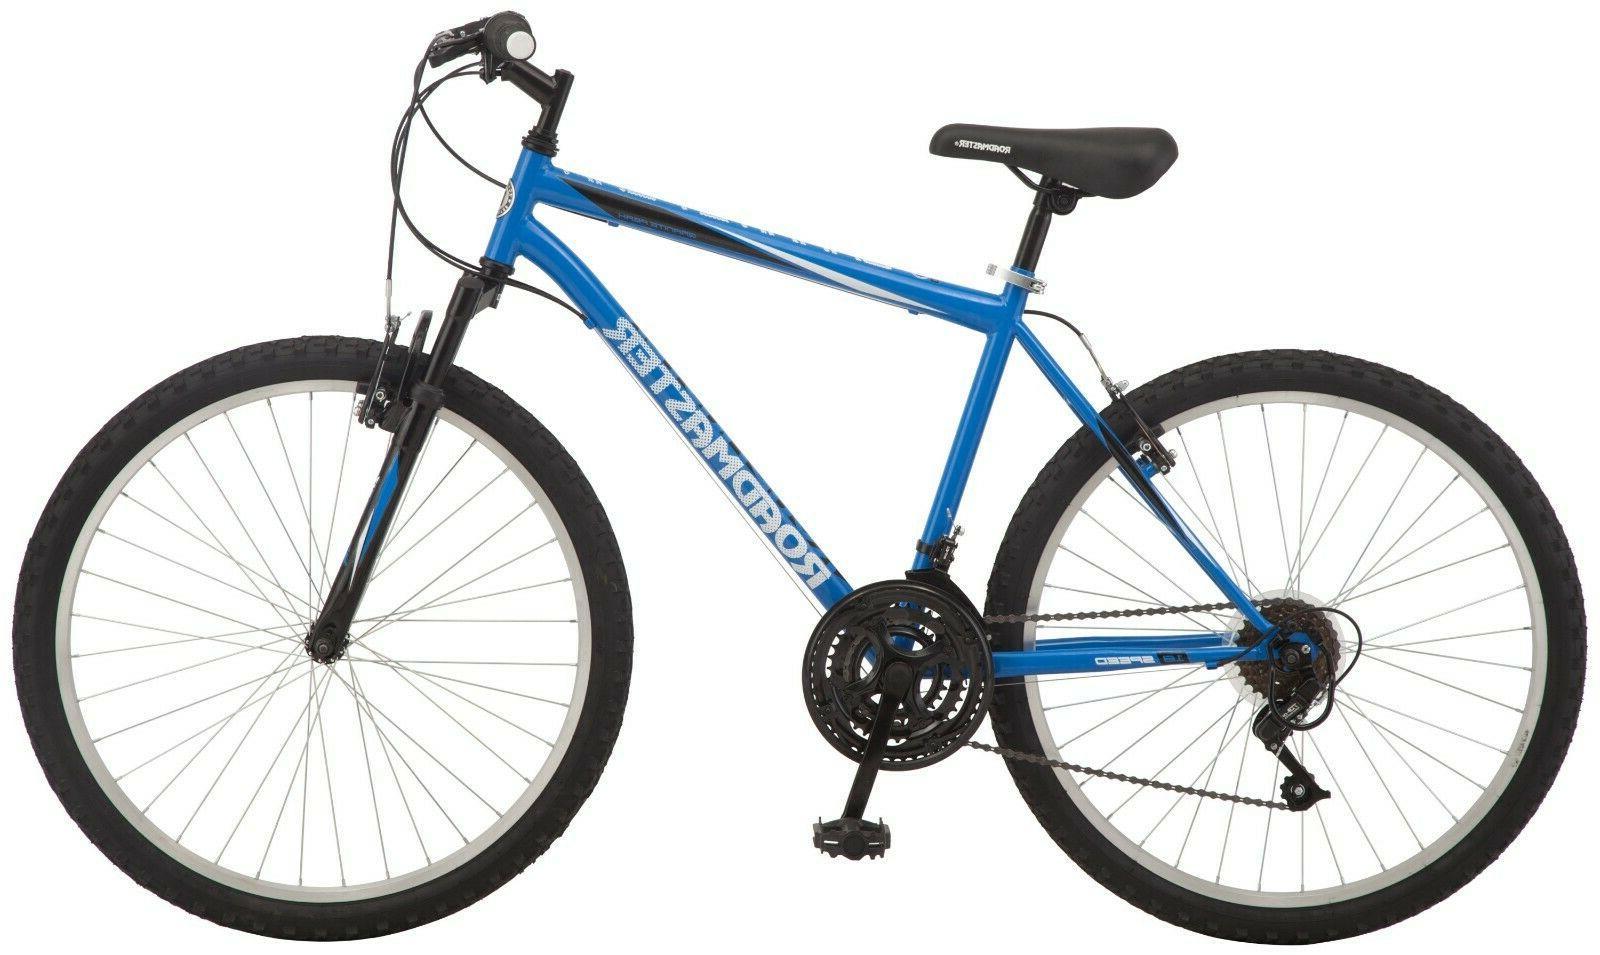 "8-speed Men's Mountain Bike 26"" wheels, Blue Front and Rear"